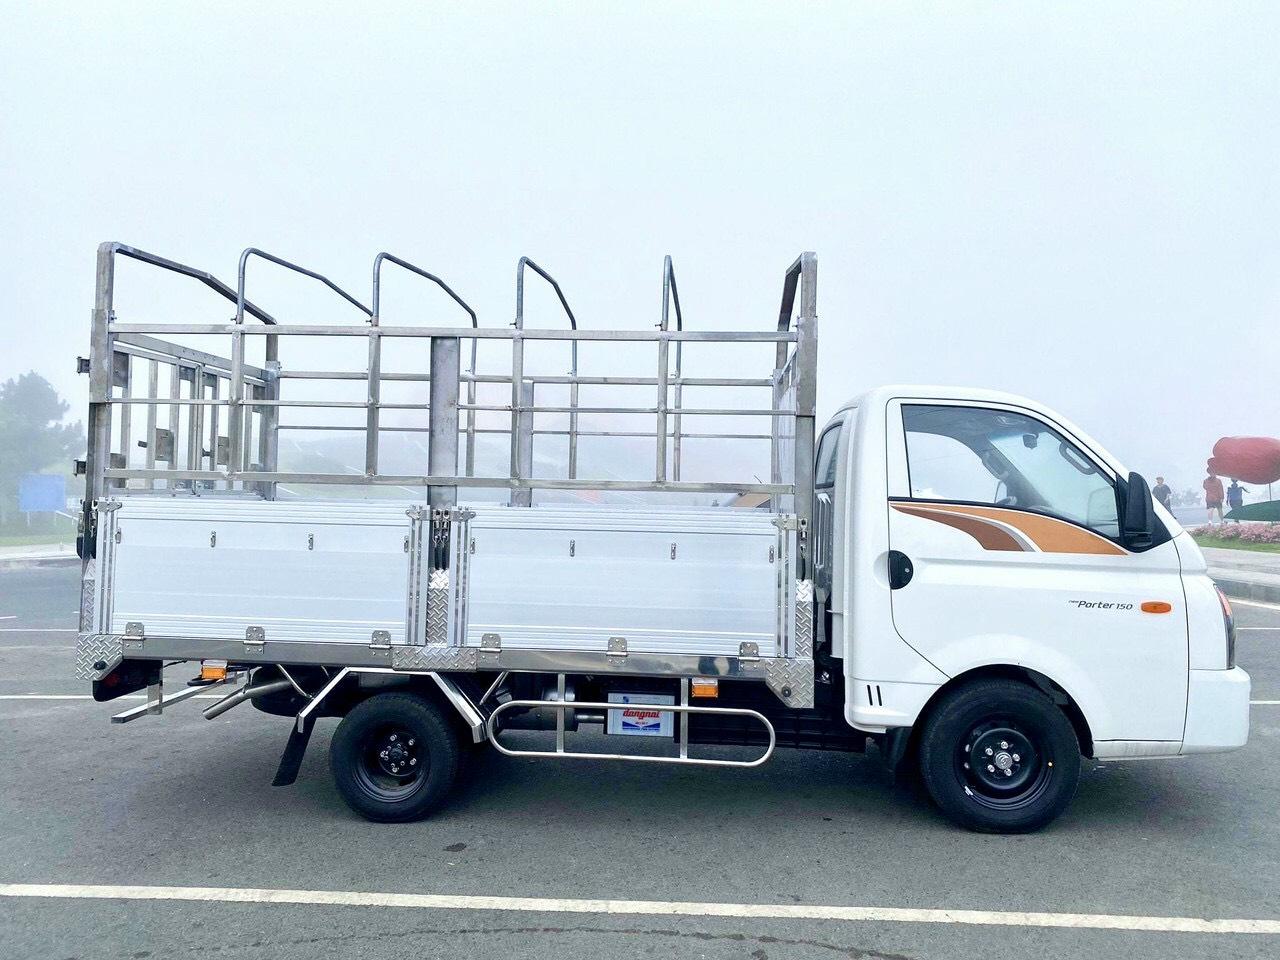 Bán xe tải Hyundai H150 tại Cao Bằng